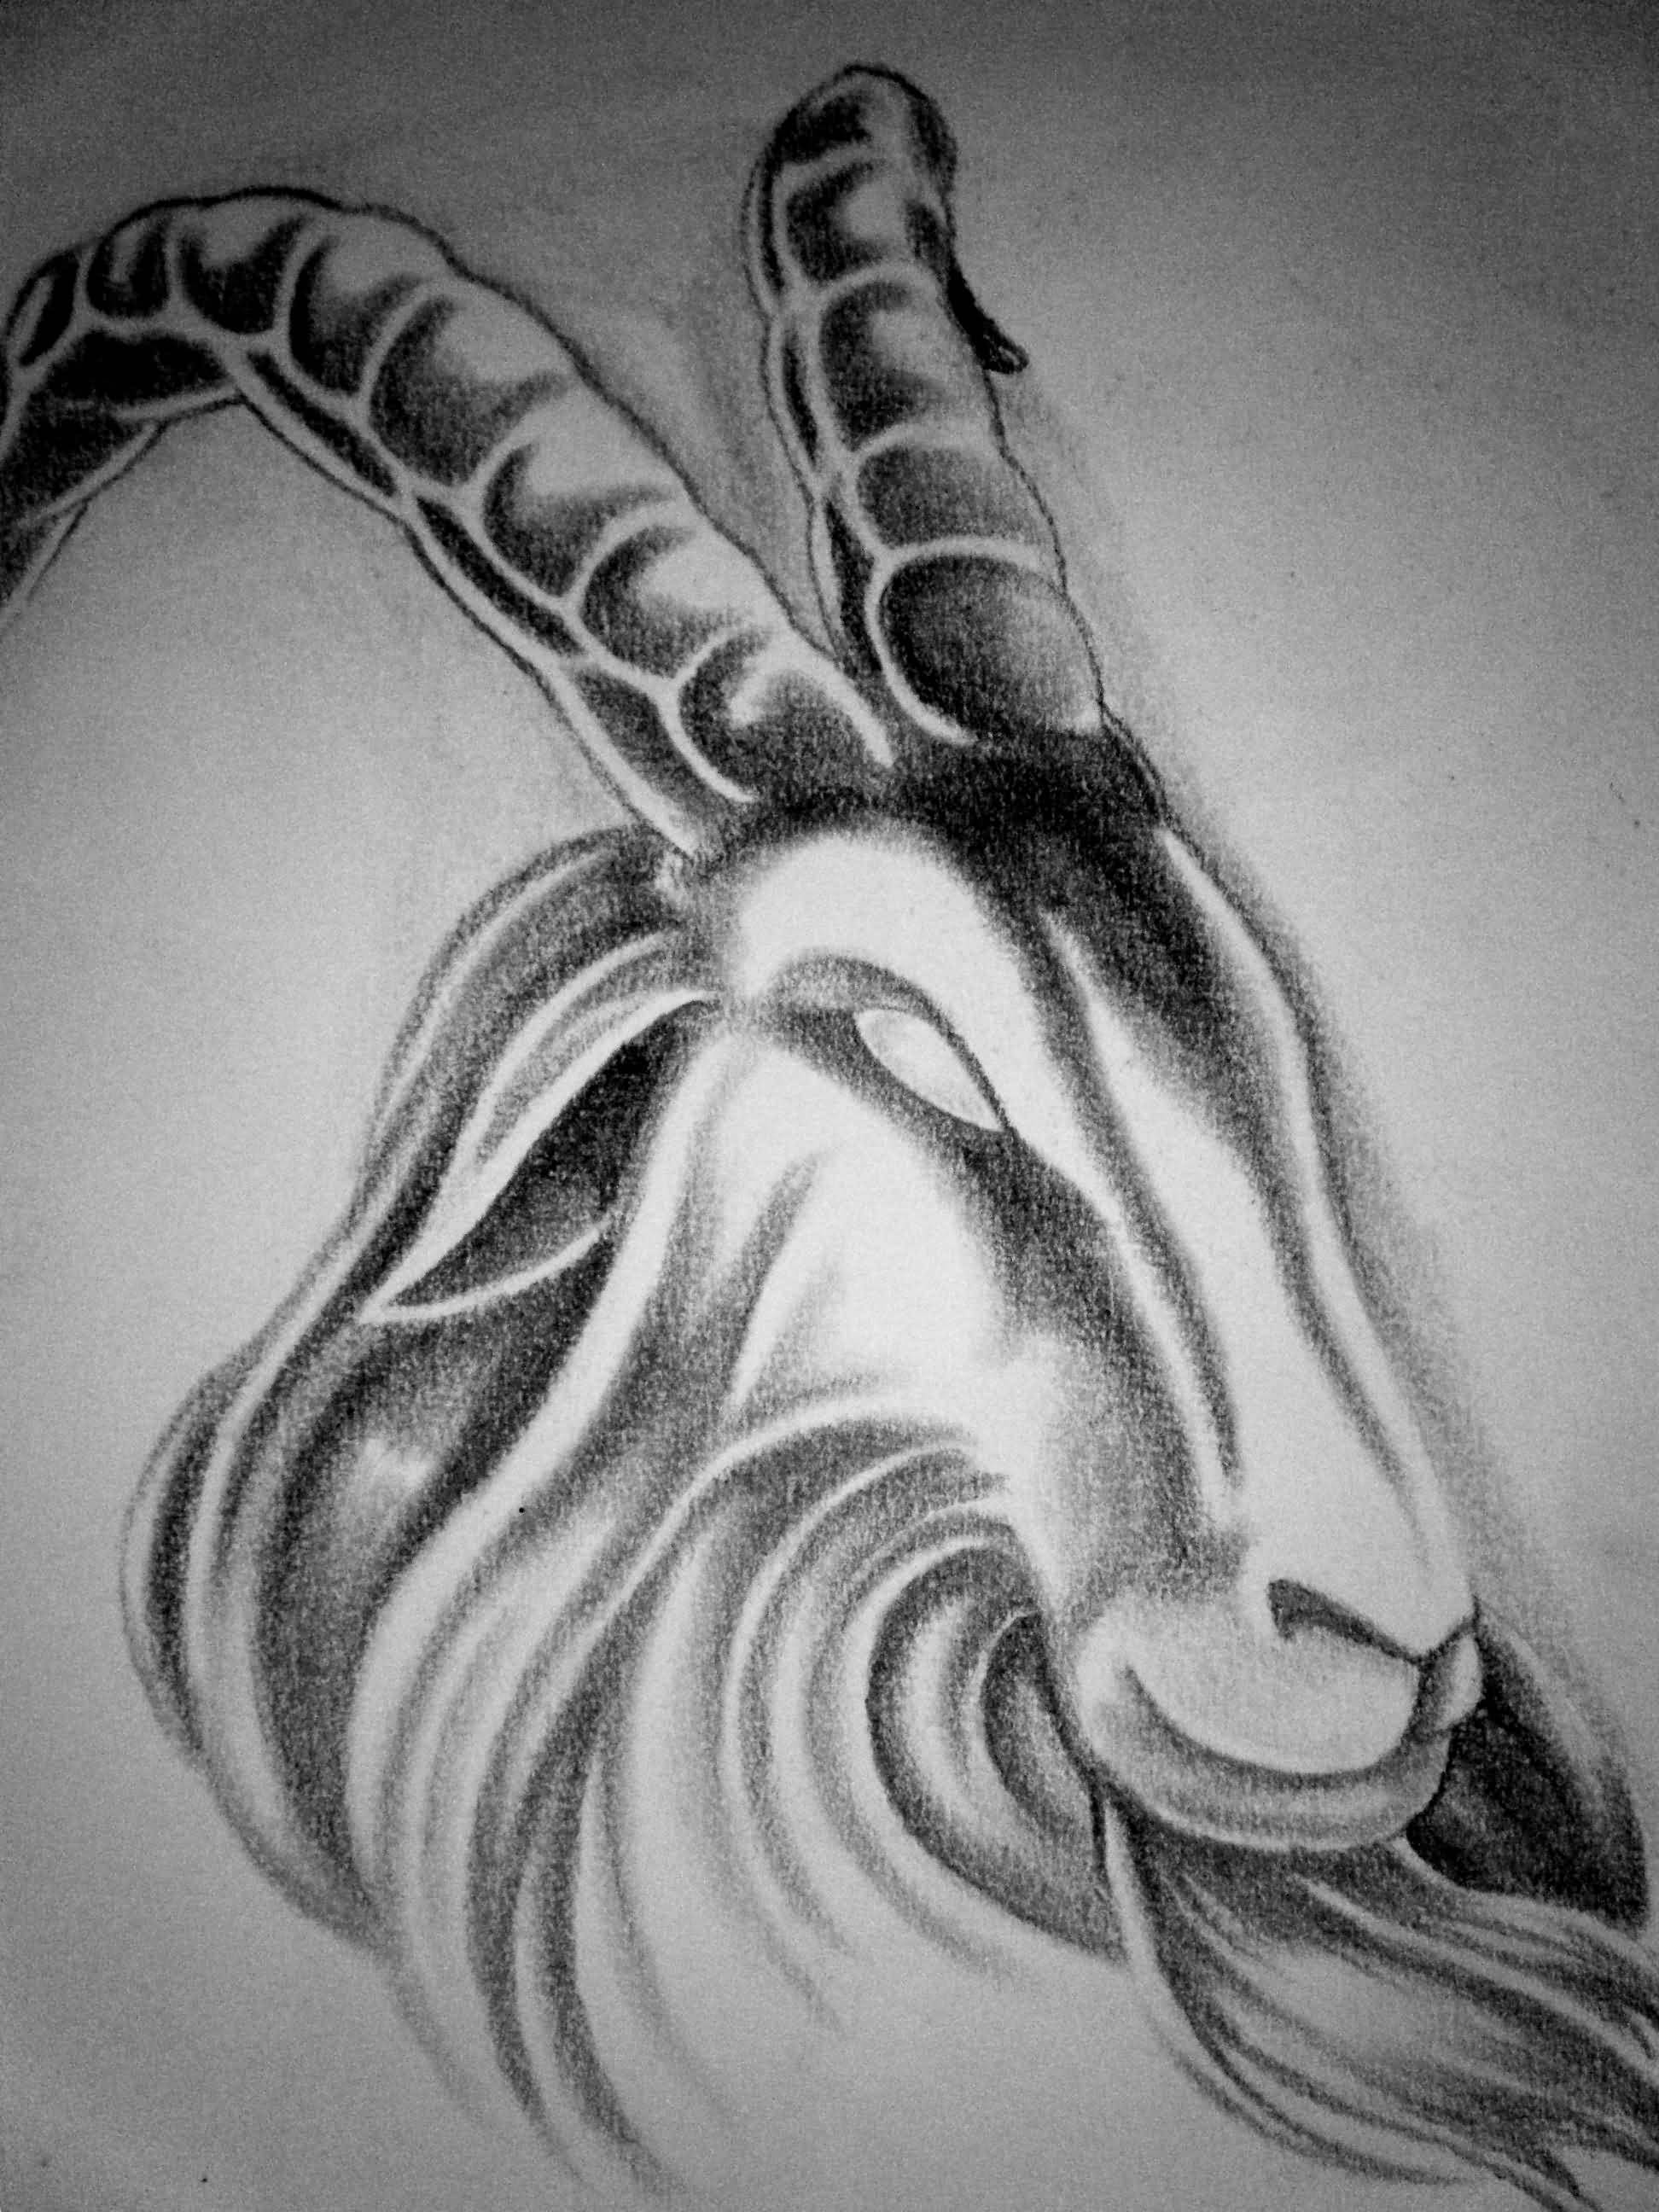 capricorn tattoo images designs. Black Bedroom Furniture Sets. Home Design Ideas